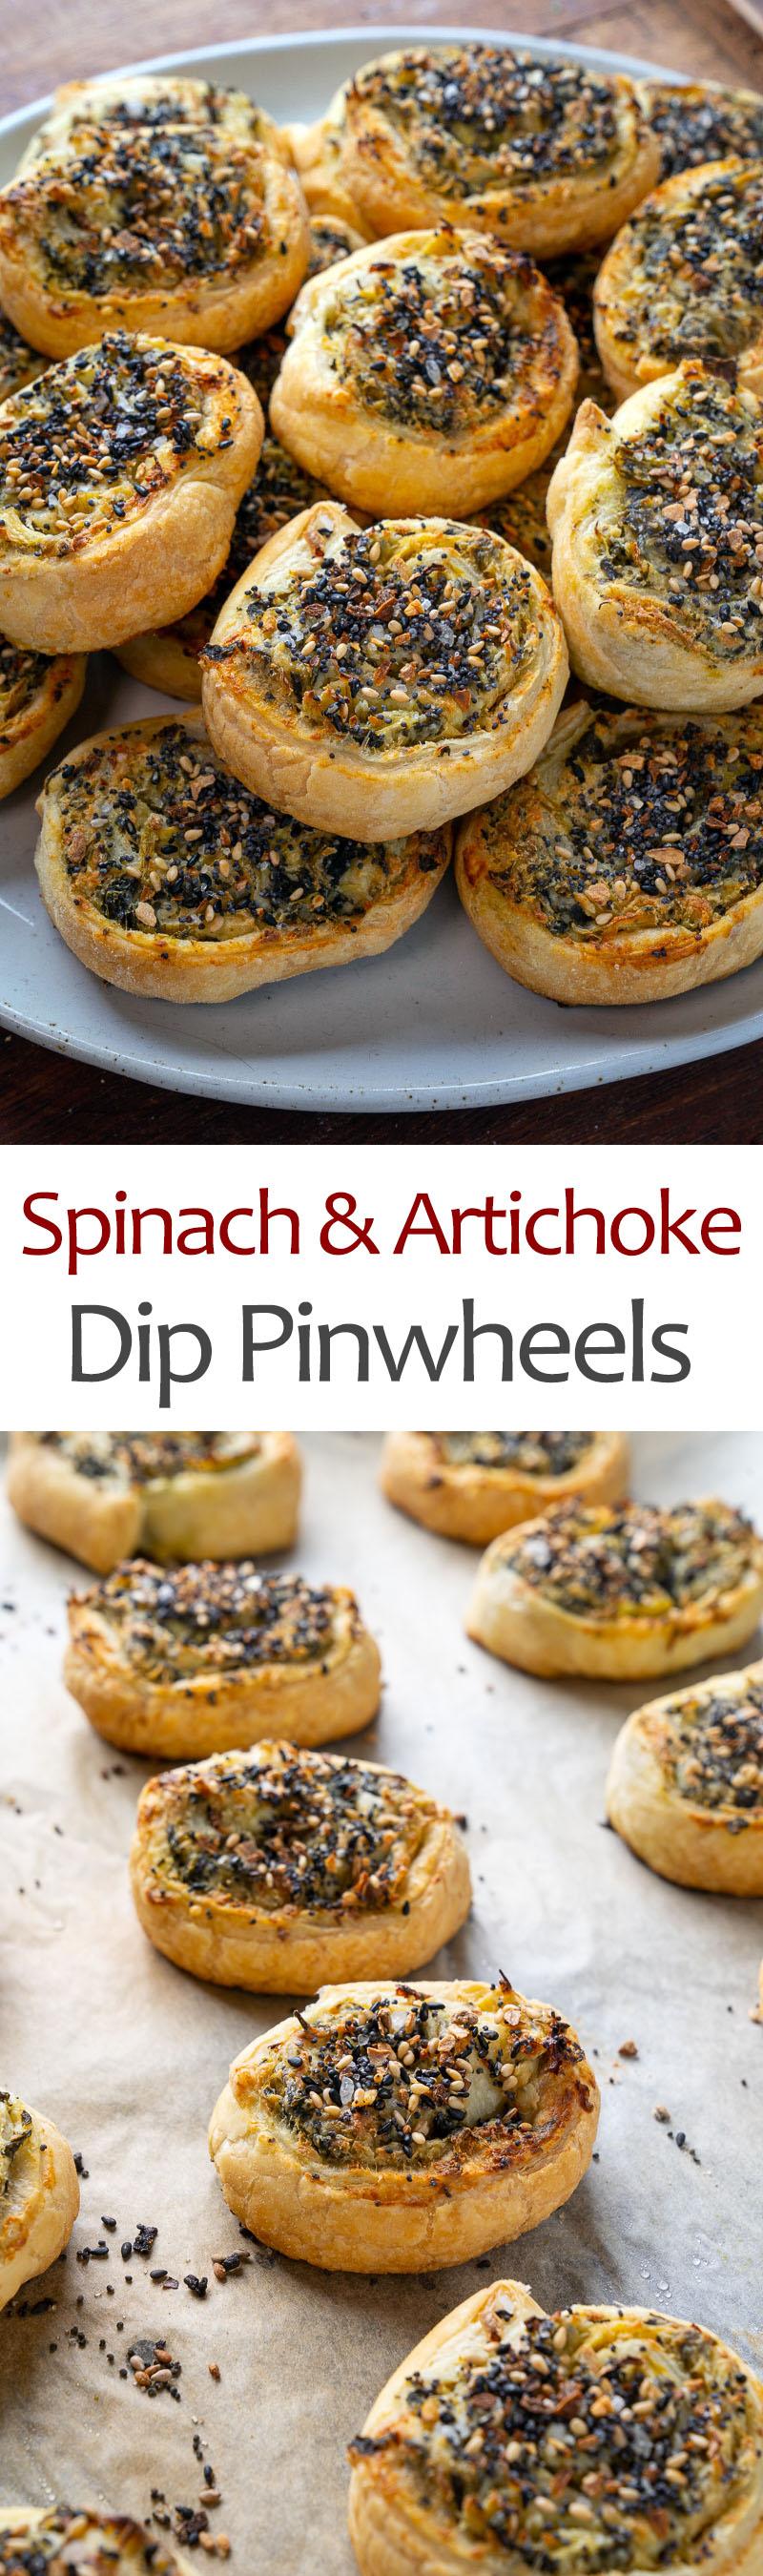 Spinach and Artichoke Dip Pinwheels